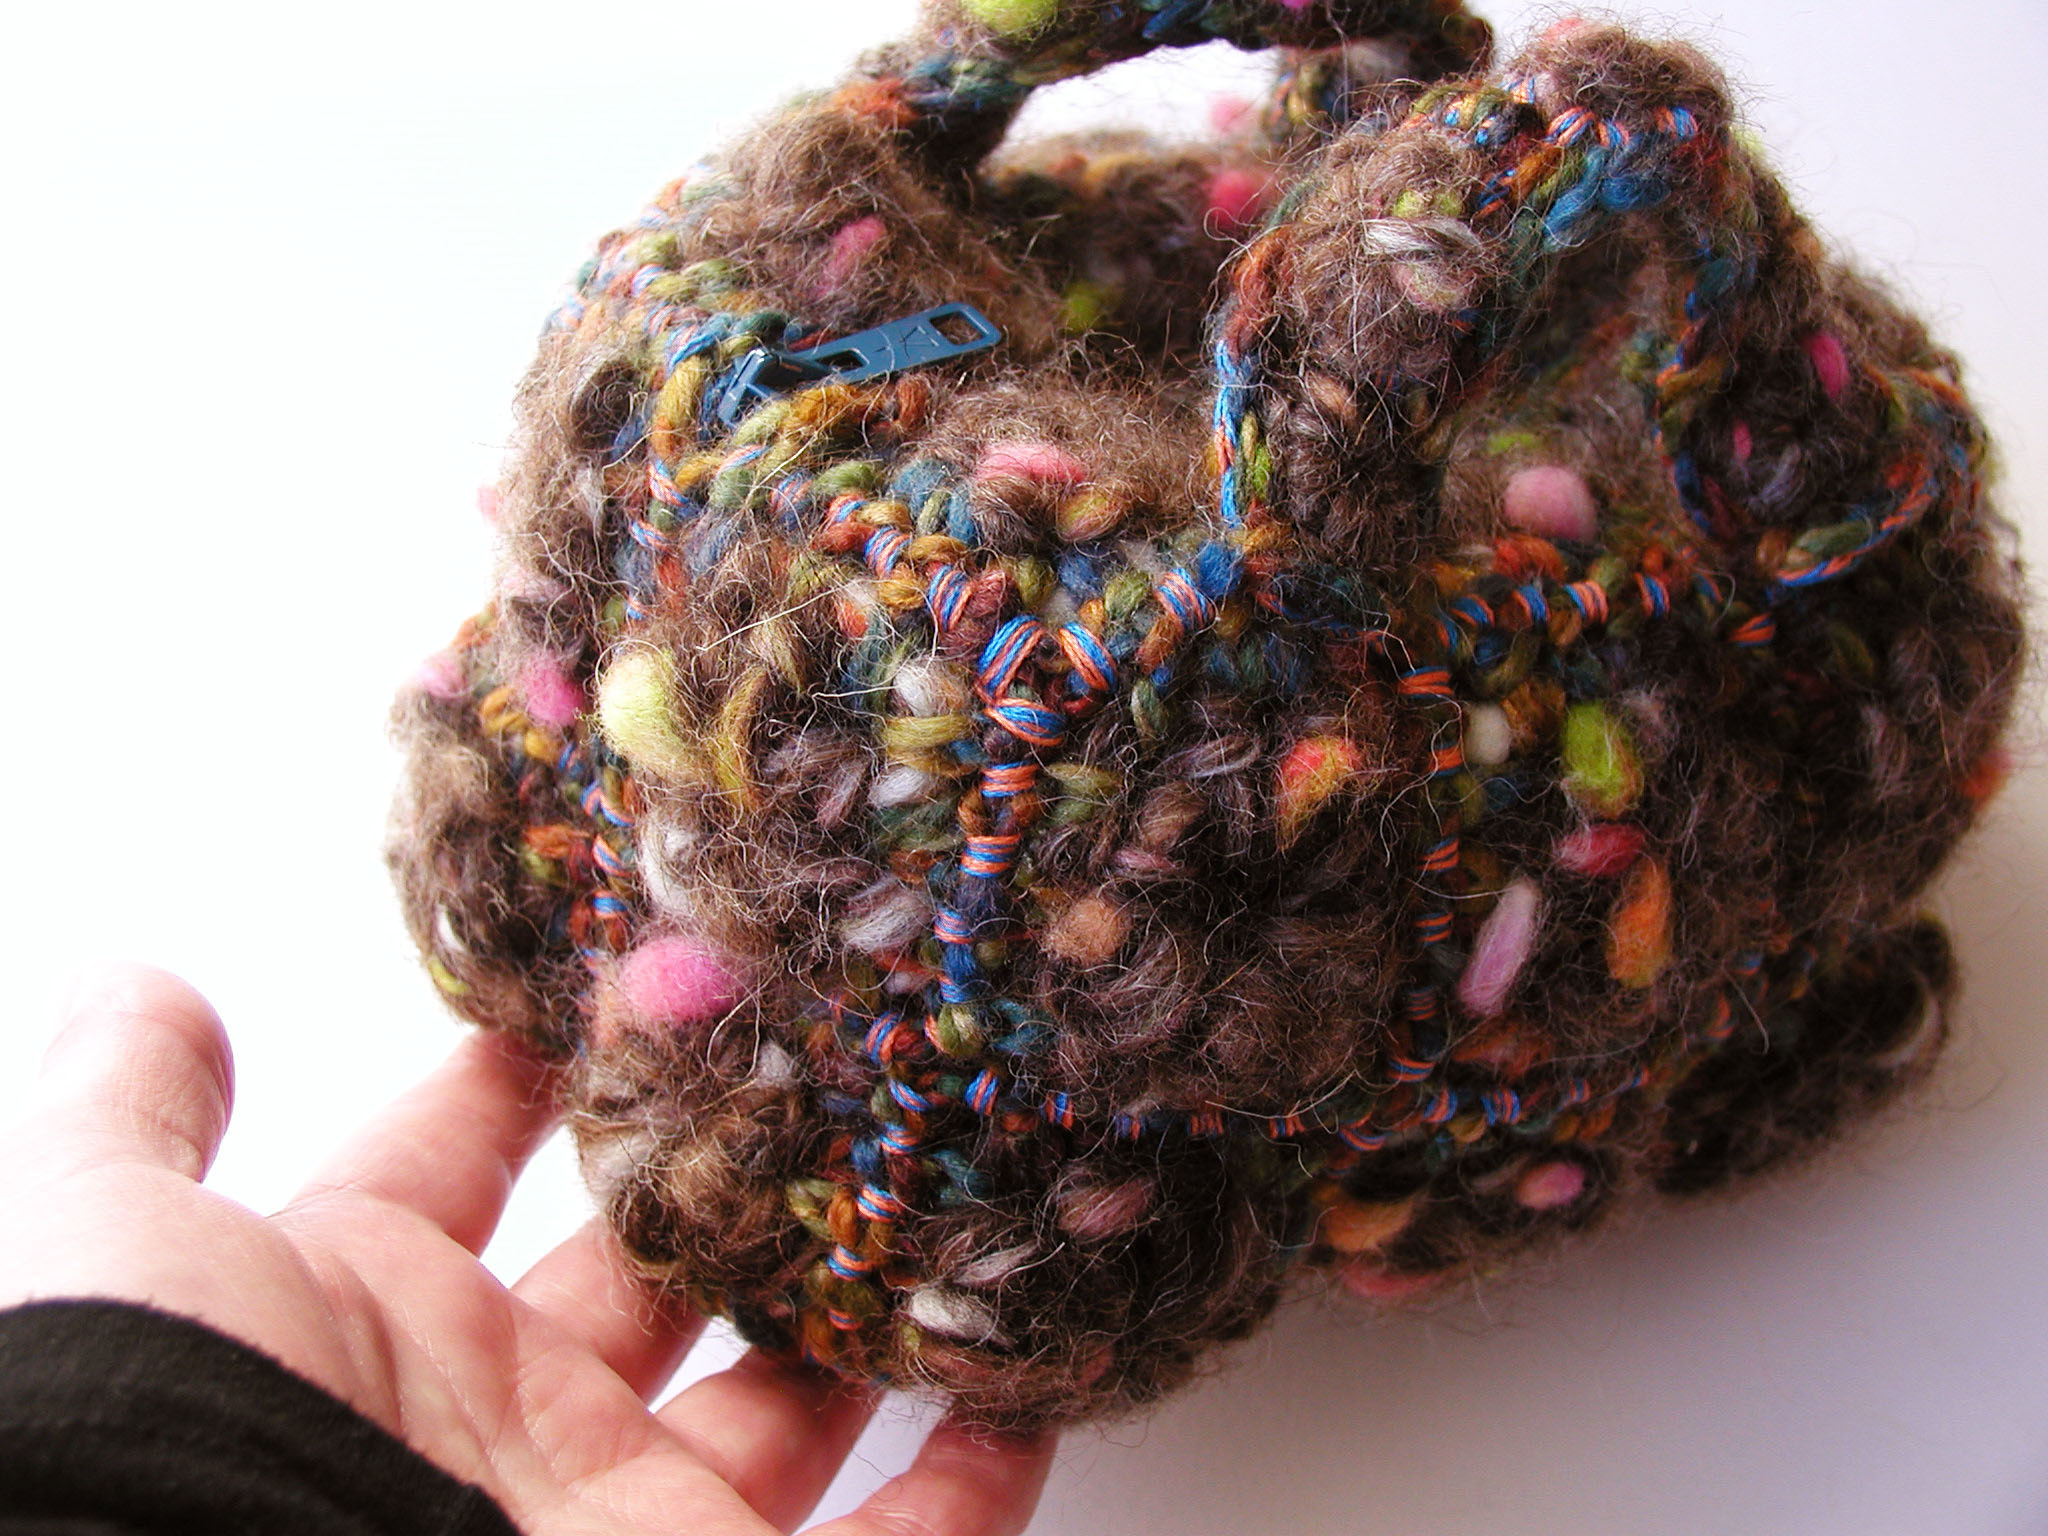 Chetana Special Mini Bag - Chetana mini borsa Speciale